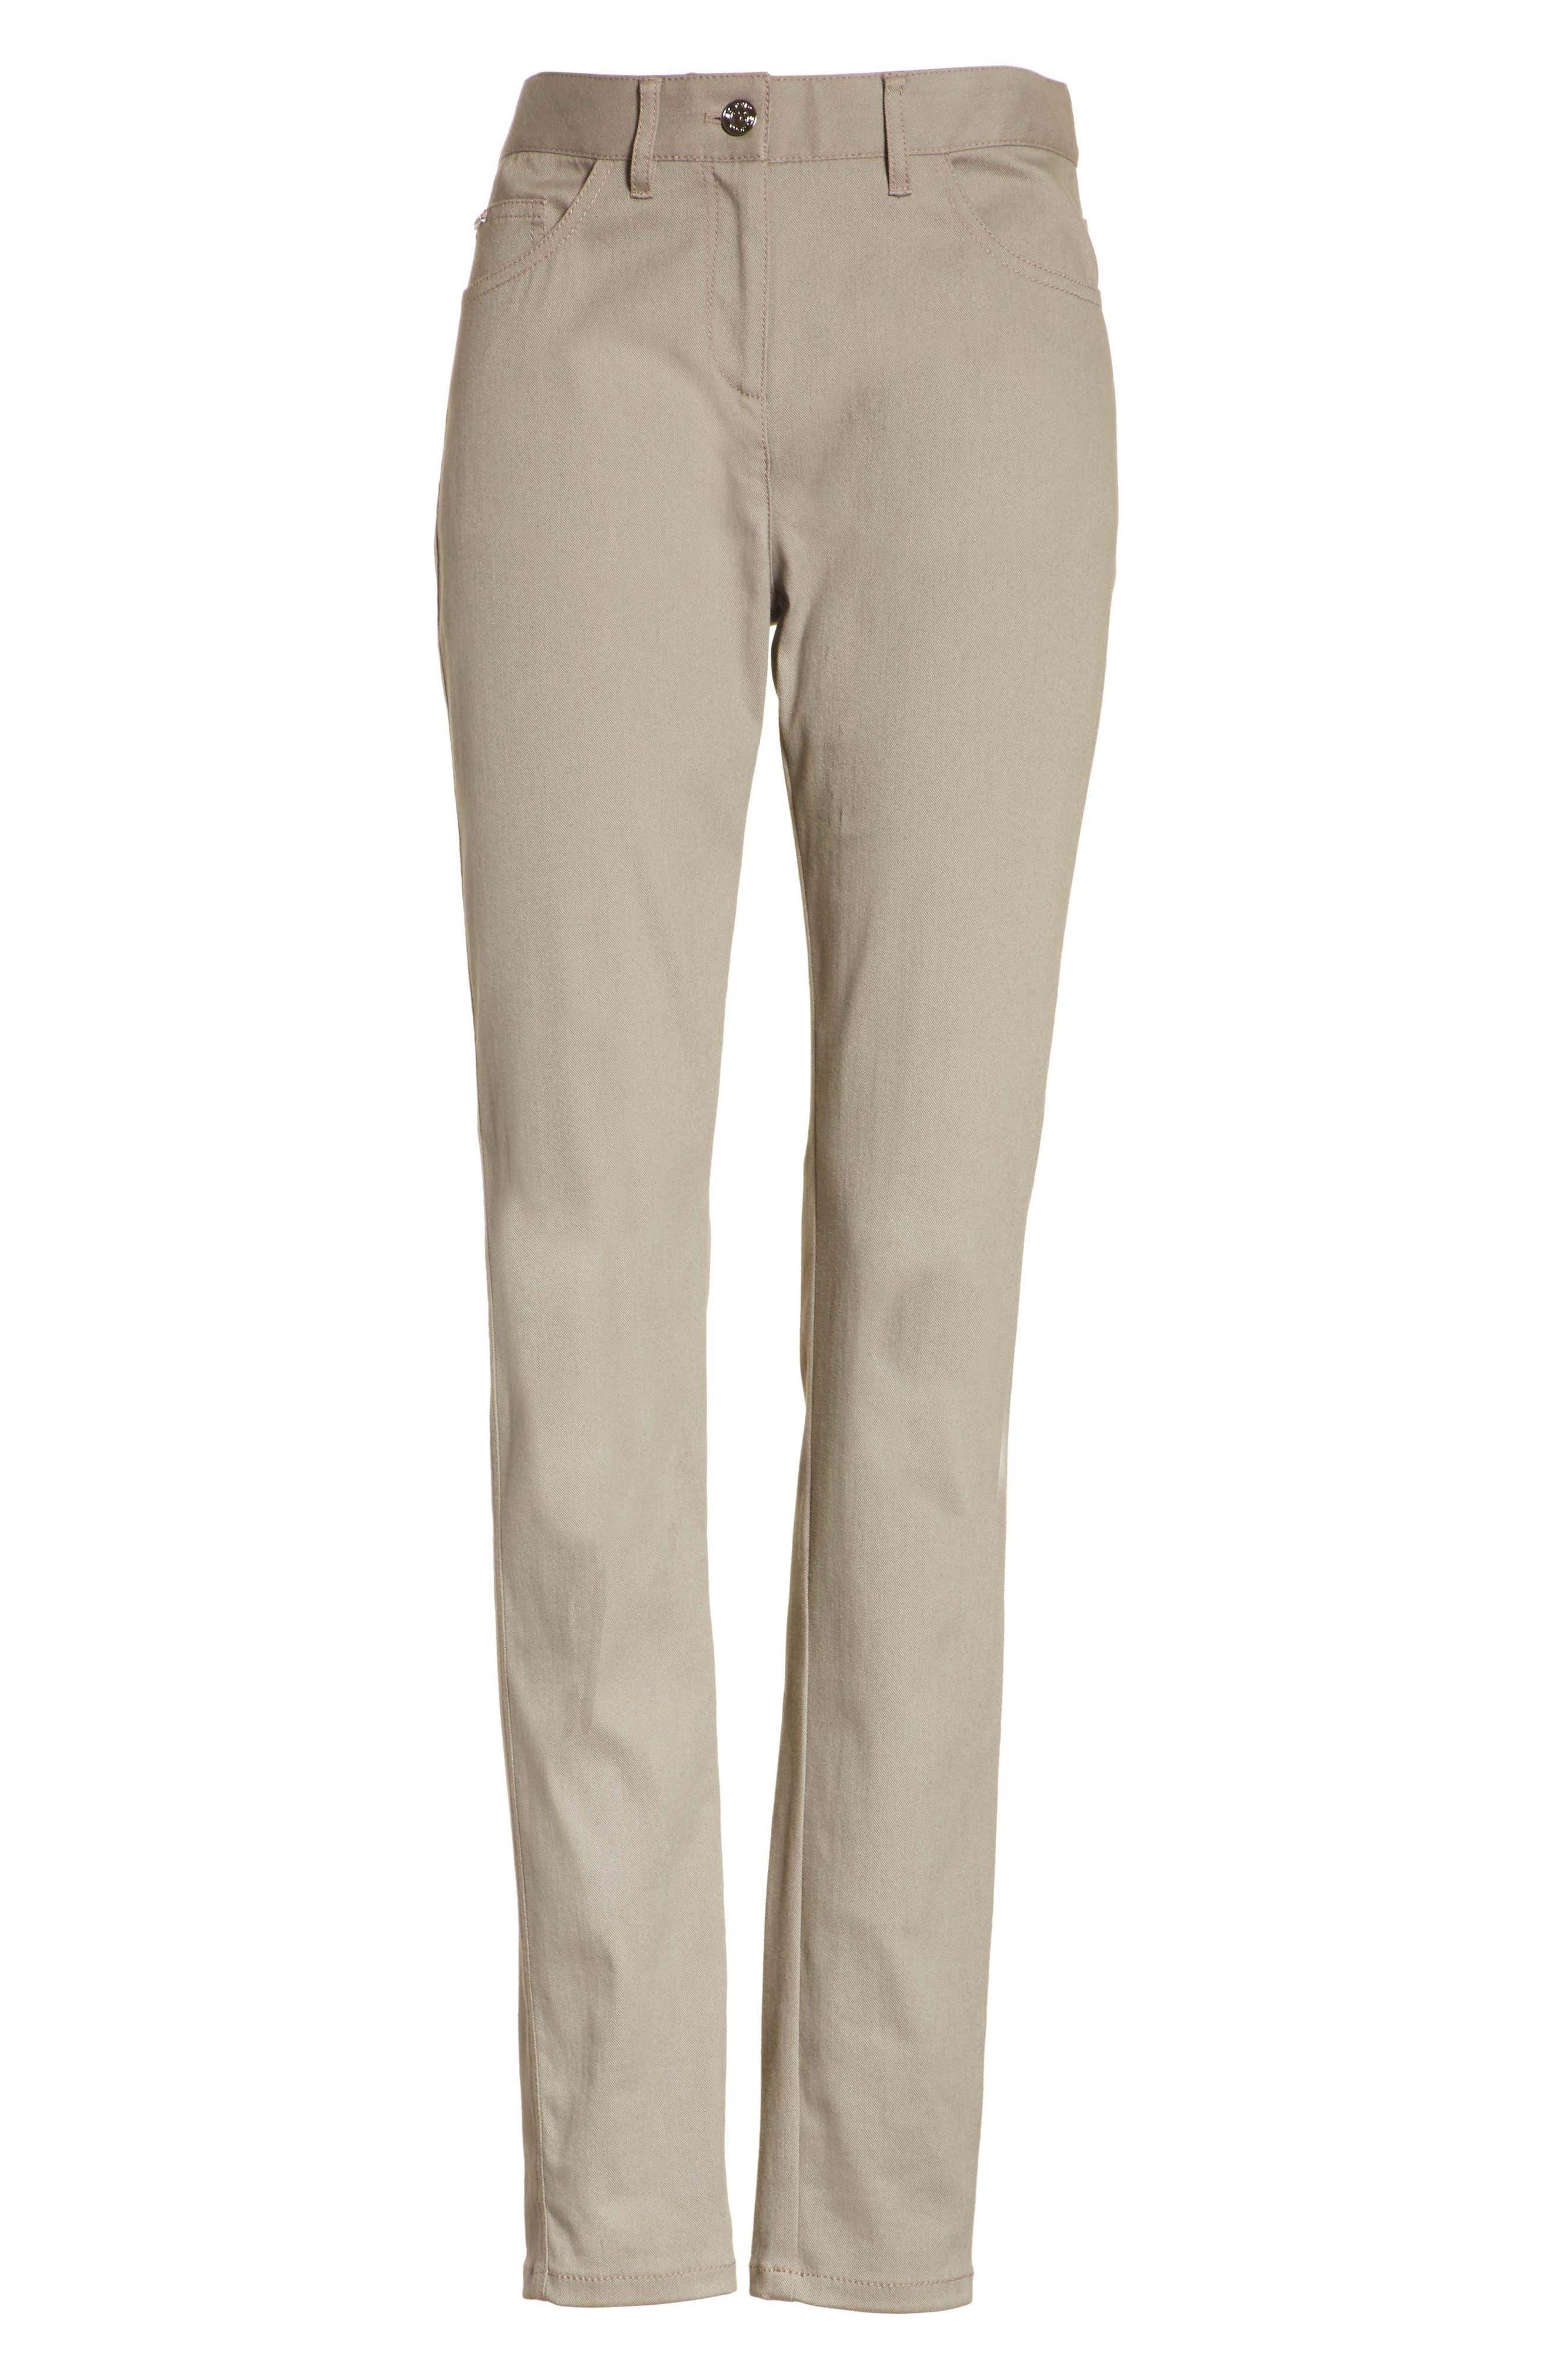 Bardot Double Dye Stretch Jeans,                             Alternate thumbnail 6, color,                             030